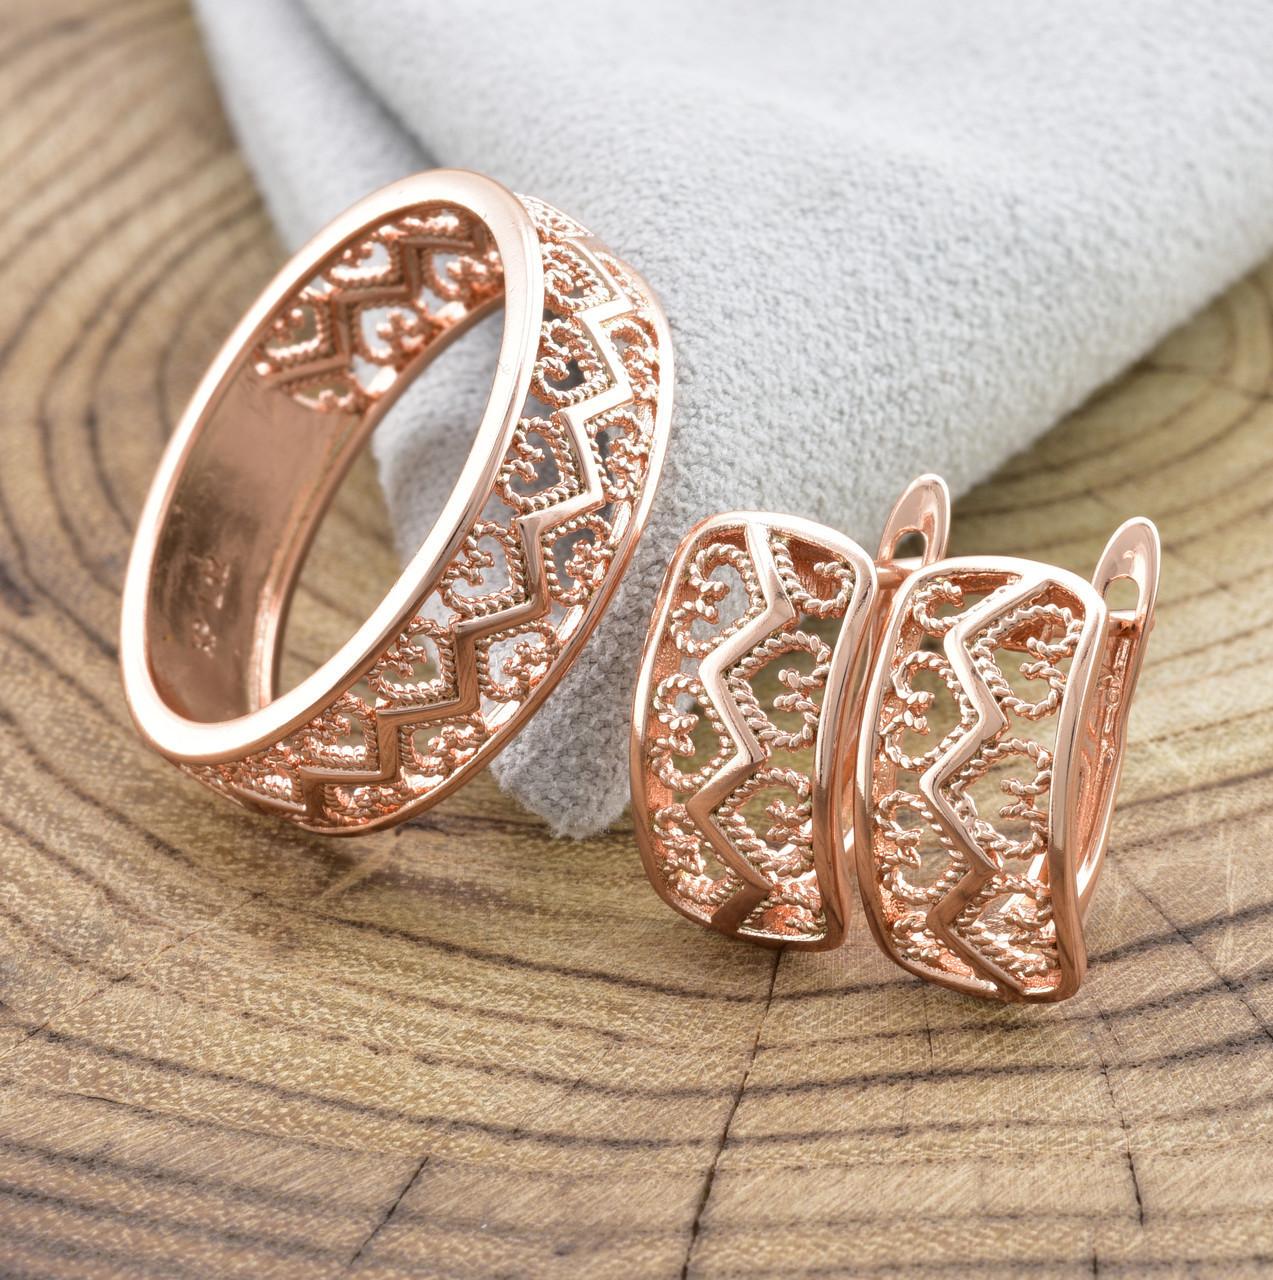 Набор Xuping Ажурное сердечко 65077 кольцо размер 22 + серьги 16х9 мм позолота РО